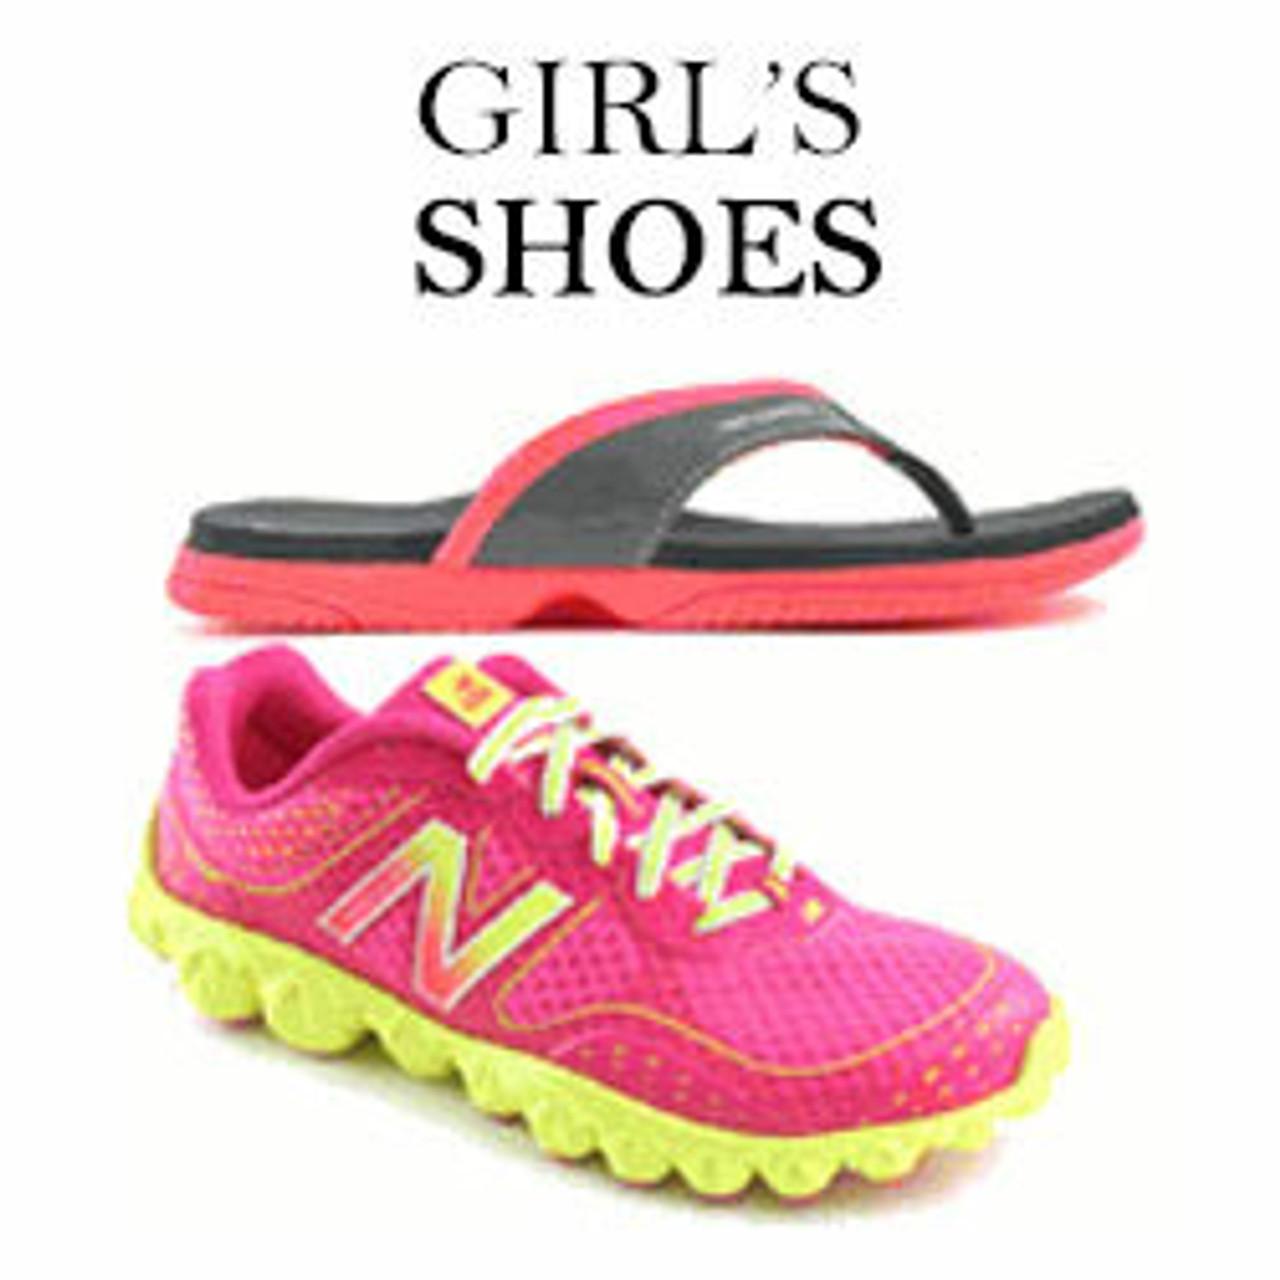 Orthopedic Shoes For Girls